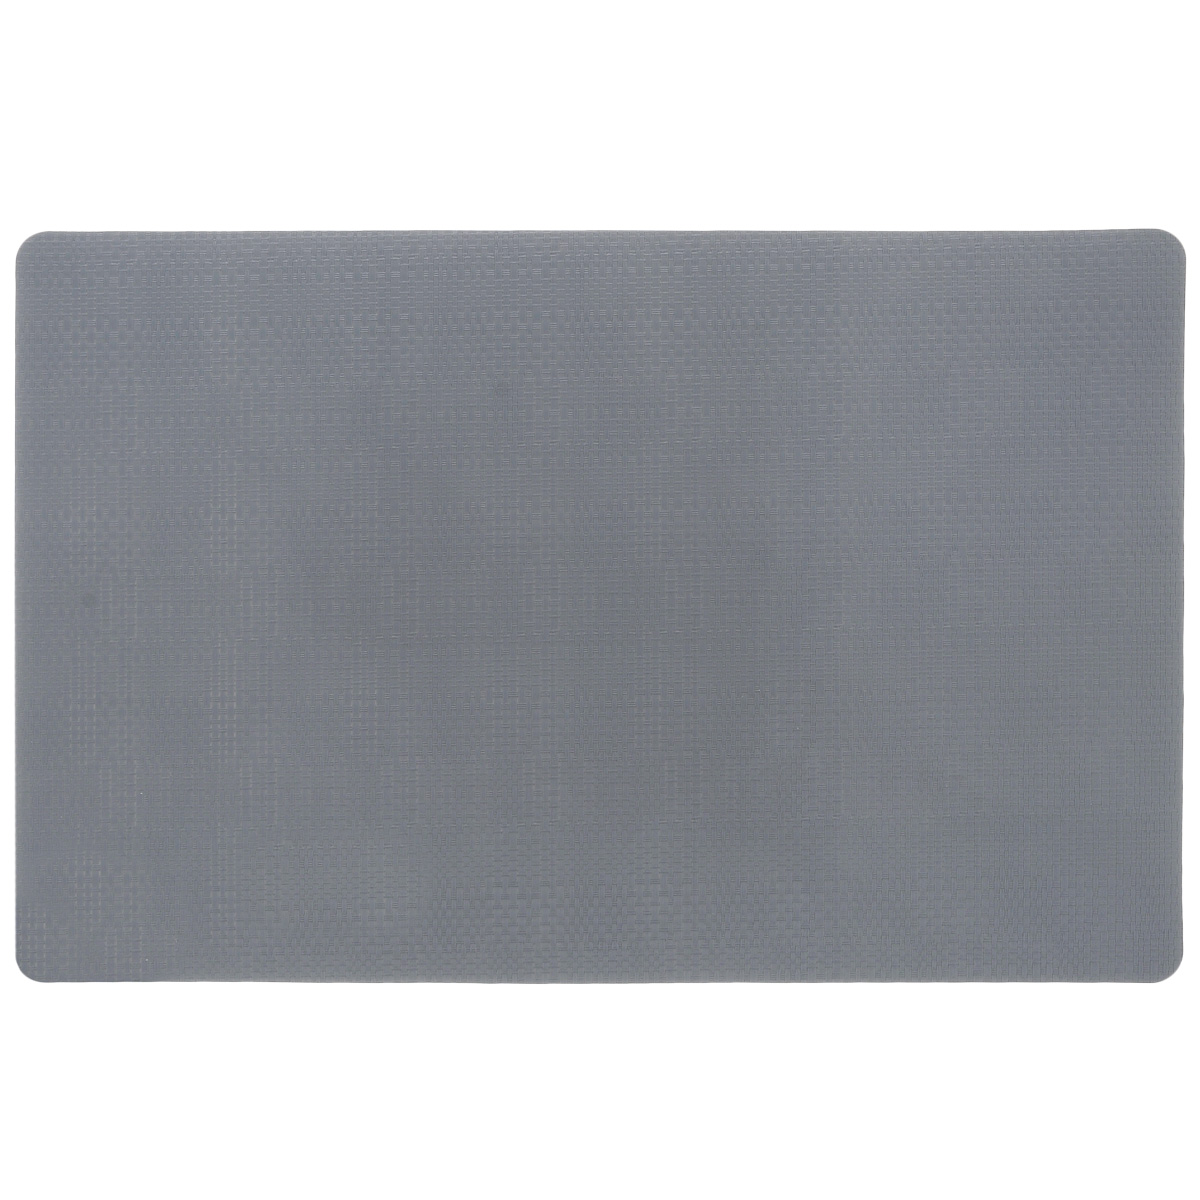 Подставка под горячее Hans & Gretchen, цвет: темно-серый, 43,5 х 28,5 см. 28HZ-9062 подставка под горячее togas андре цвет синий серый 45 х 33 см